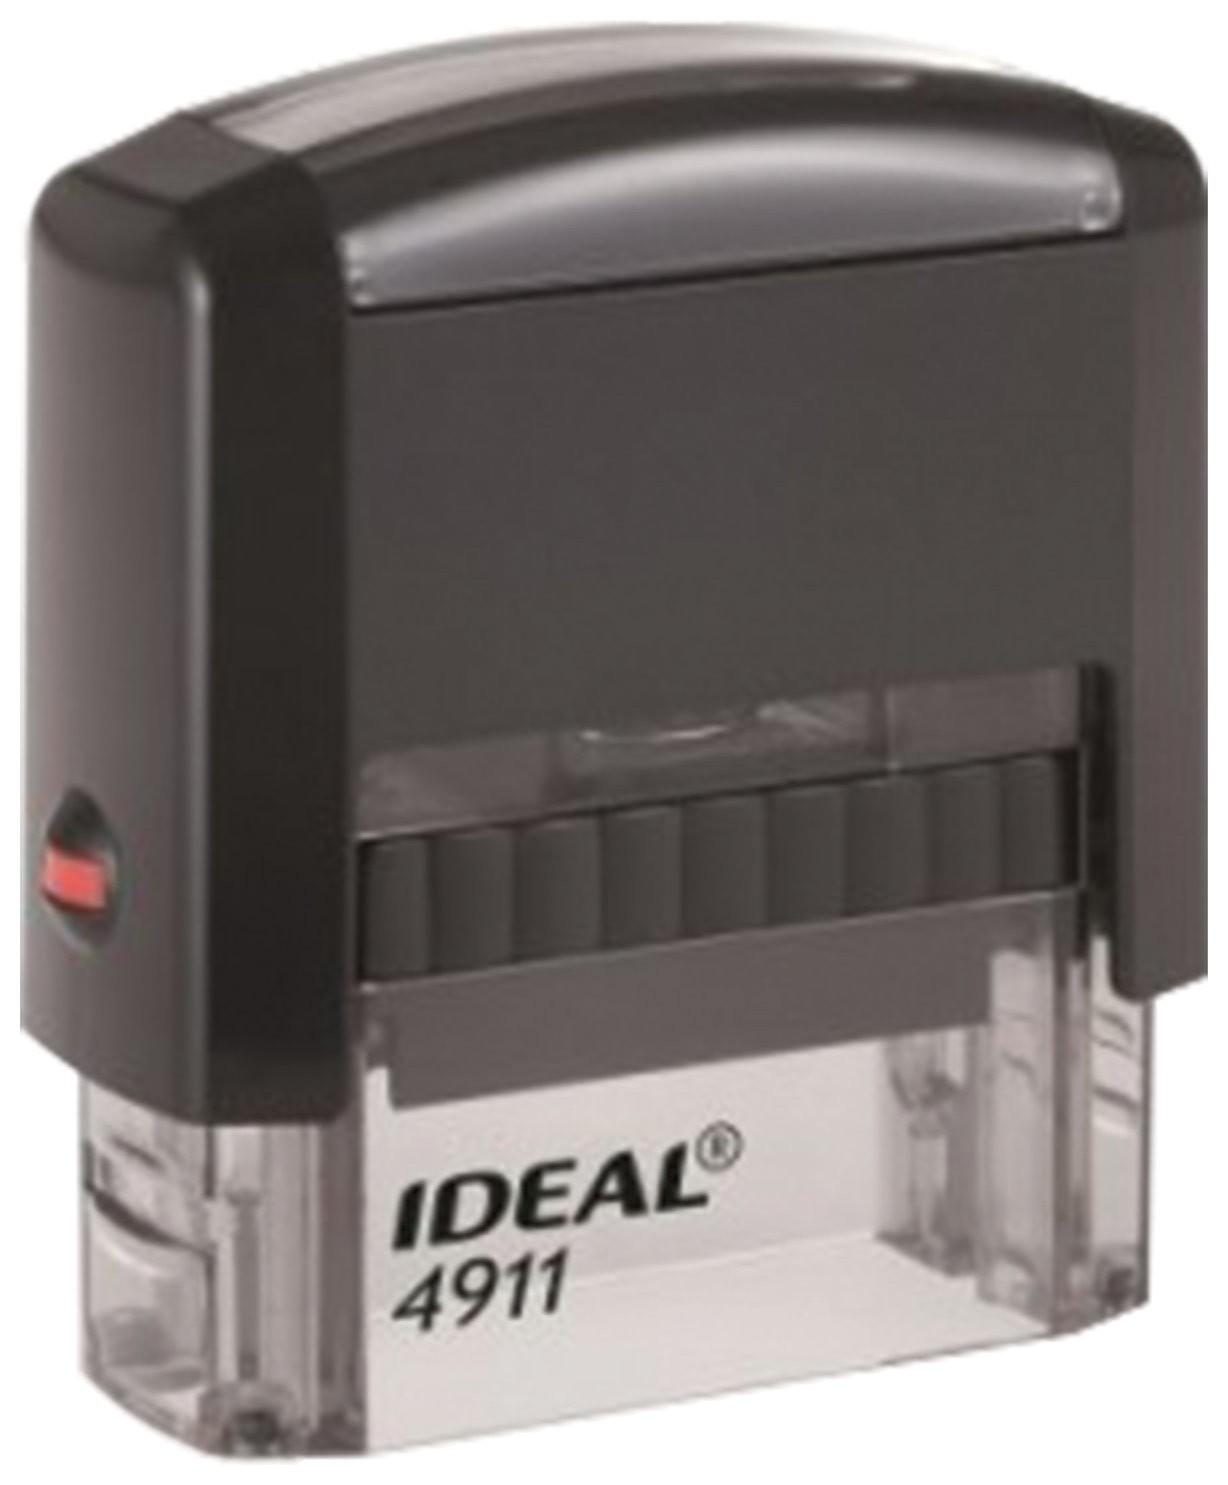 Оснастка для штампа, размер оттиска 38х14 мм синий, Trodat Ideal 4911 P2, подушка в комплекте  Trodat